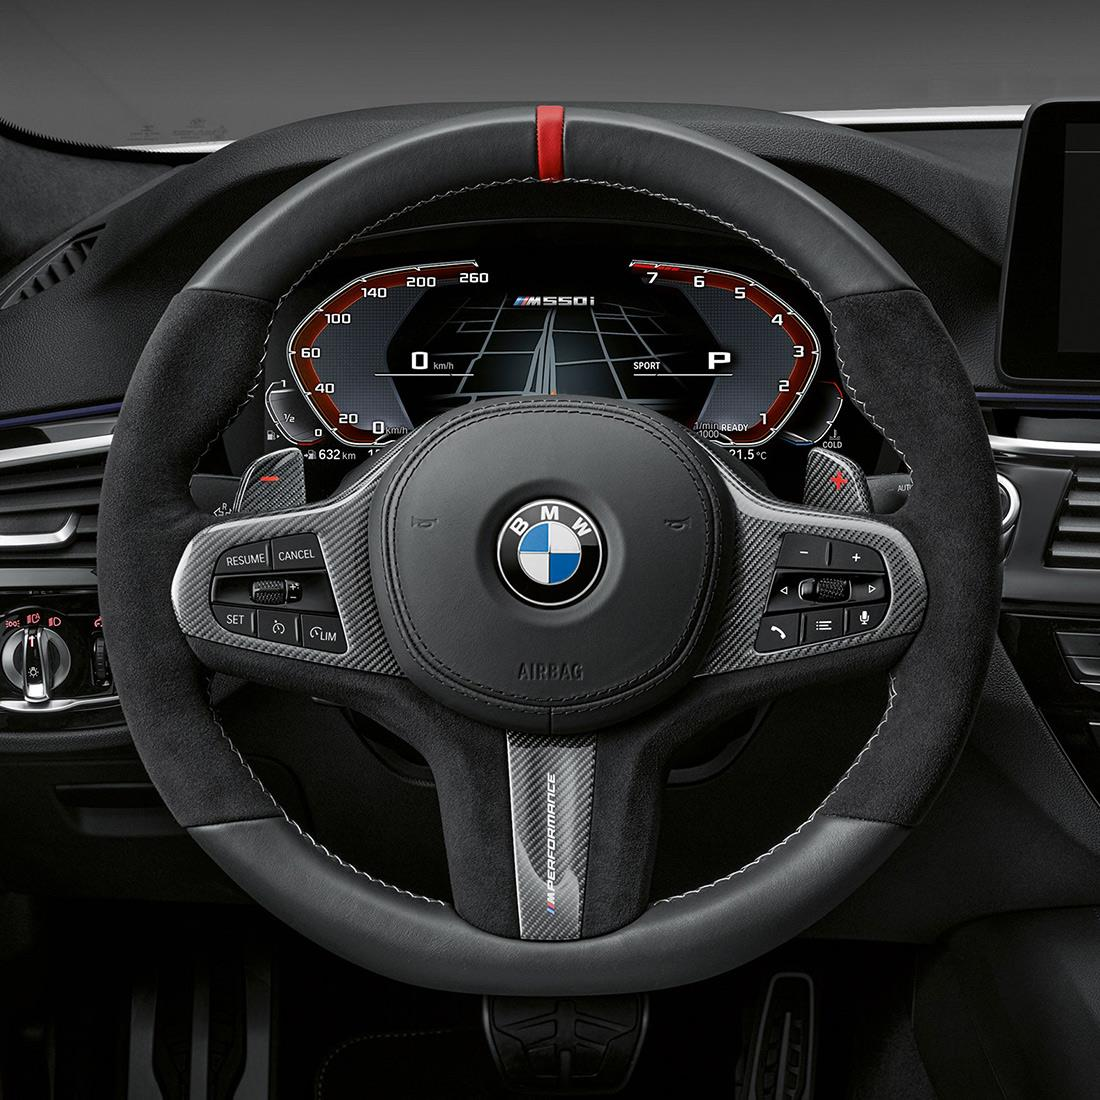 M Performance Cover in carbon fiber/Alcantara for steering wheel